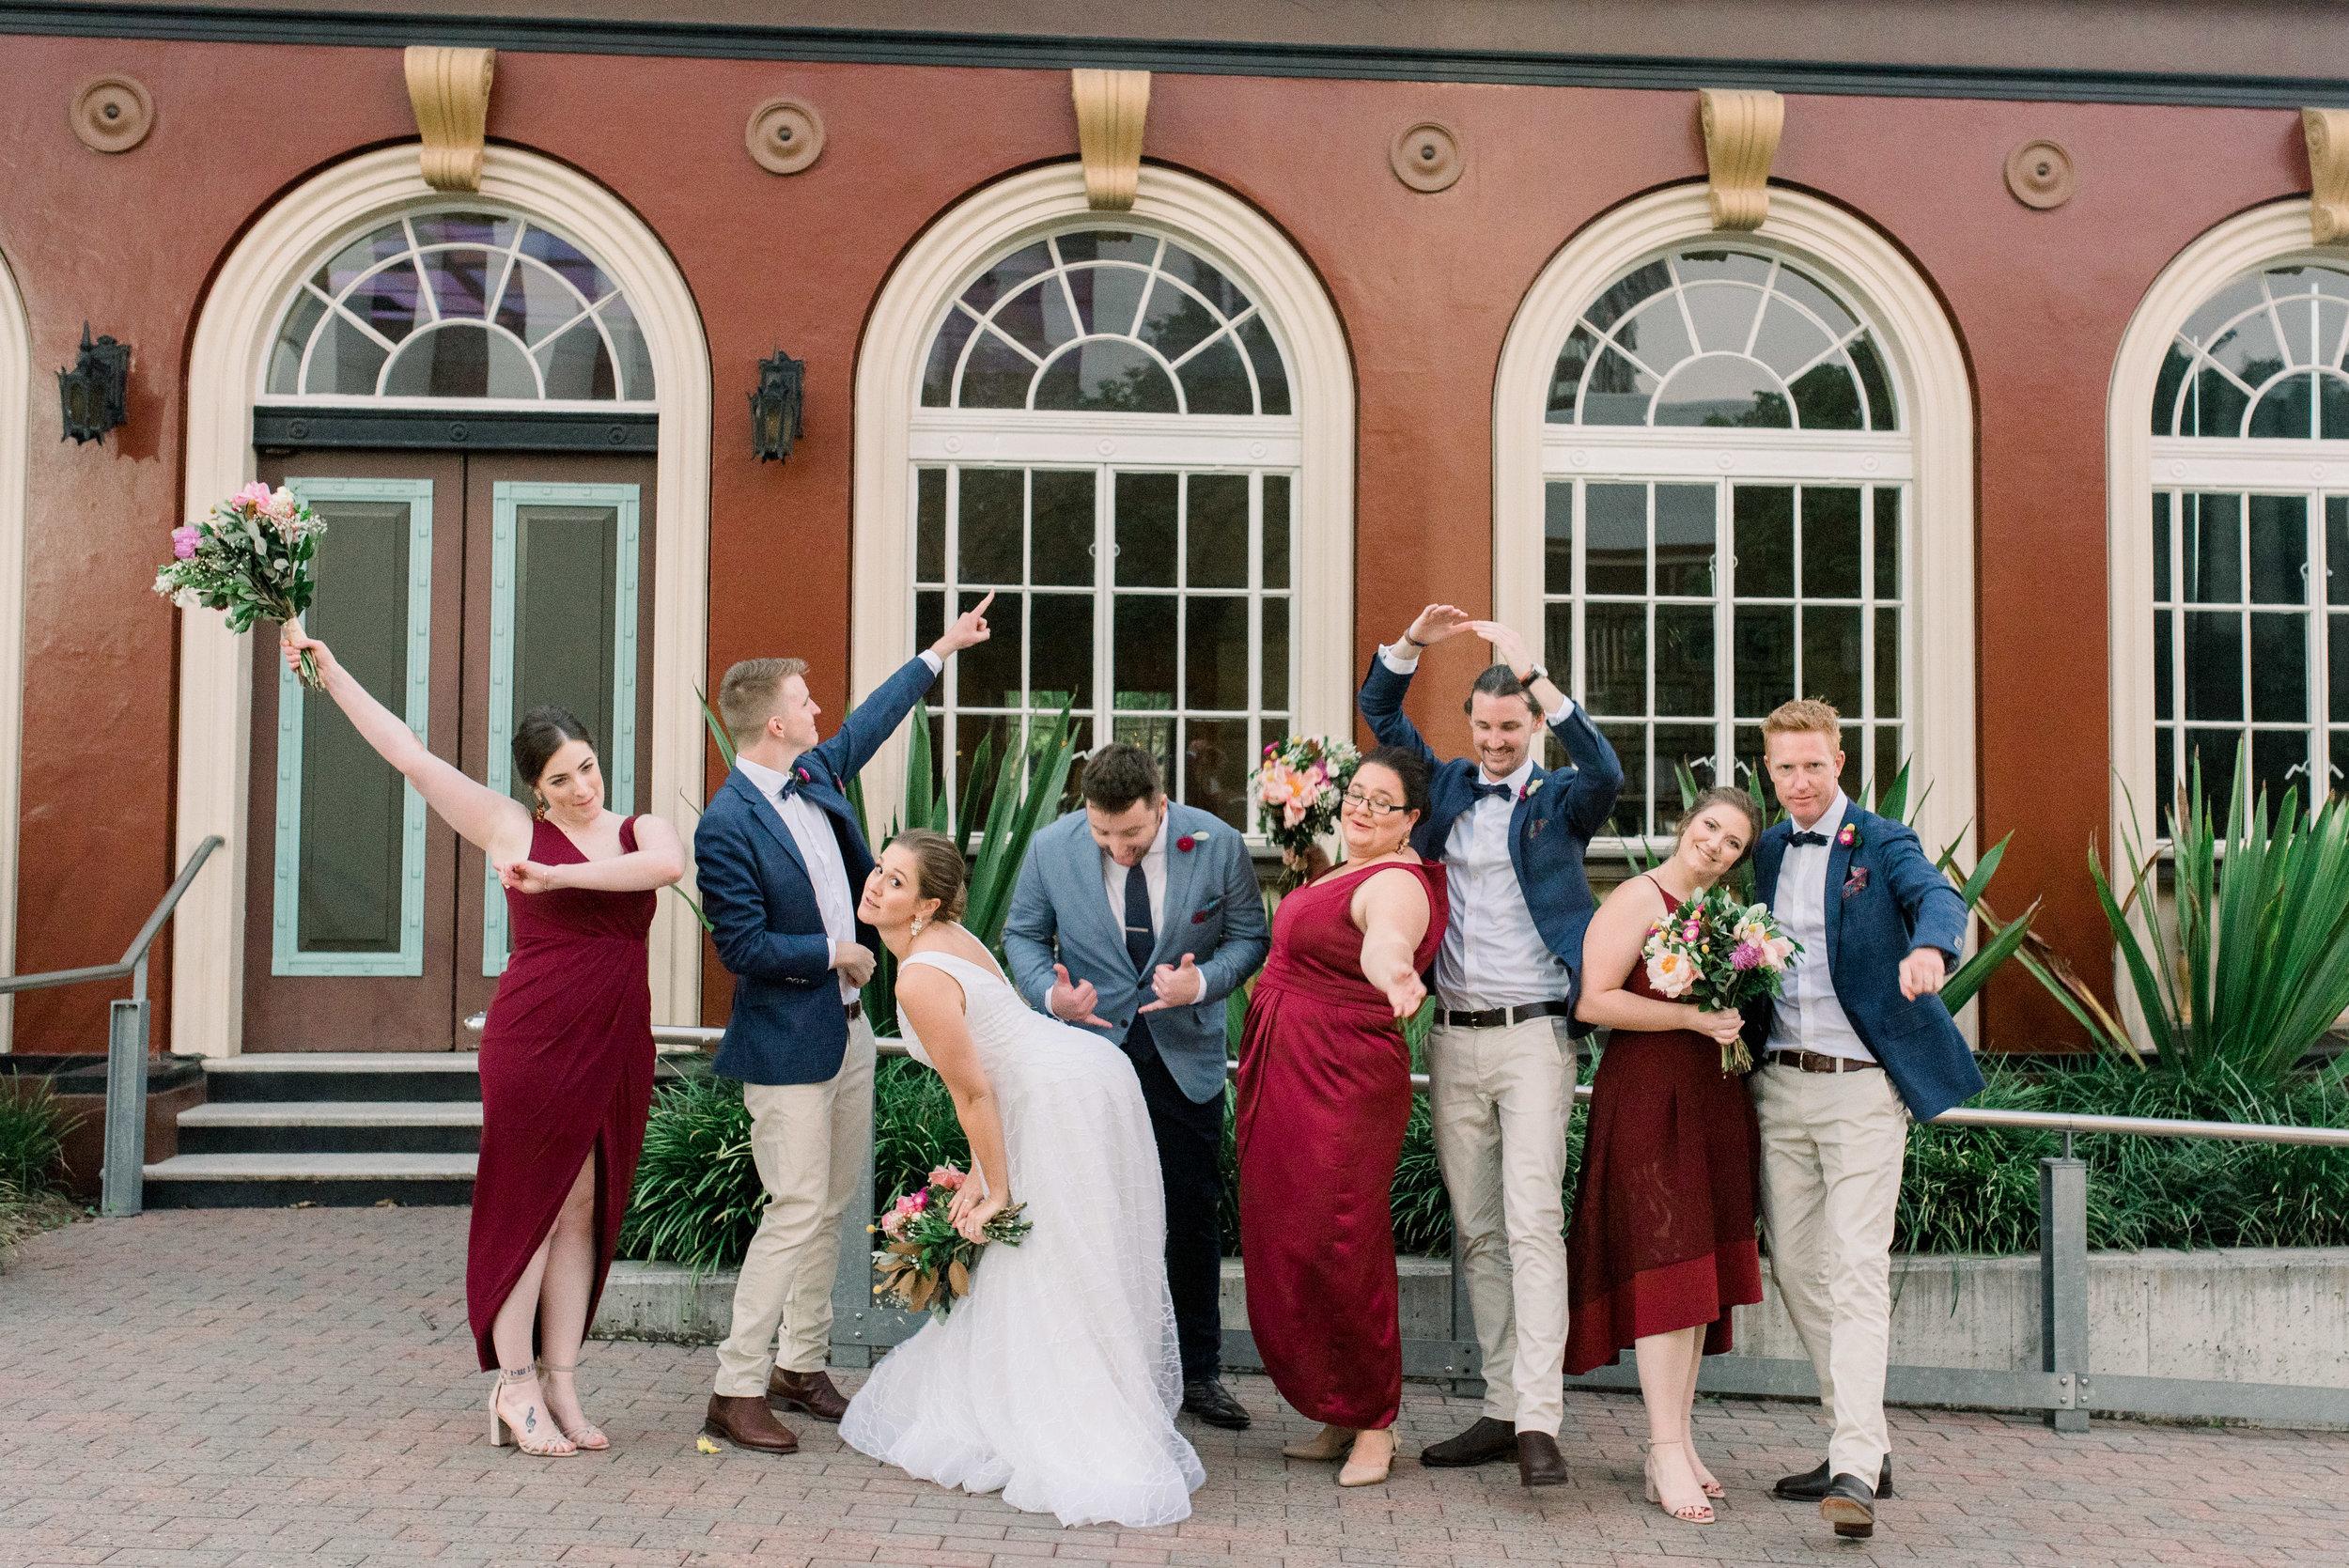 refinery-wedding-brisbane-city-wedding-photographer-75.jpg